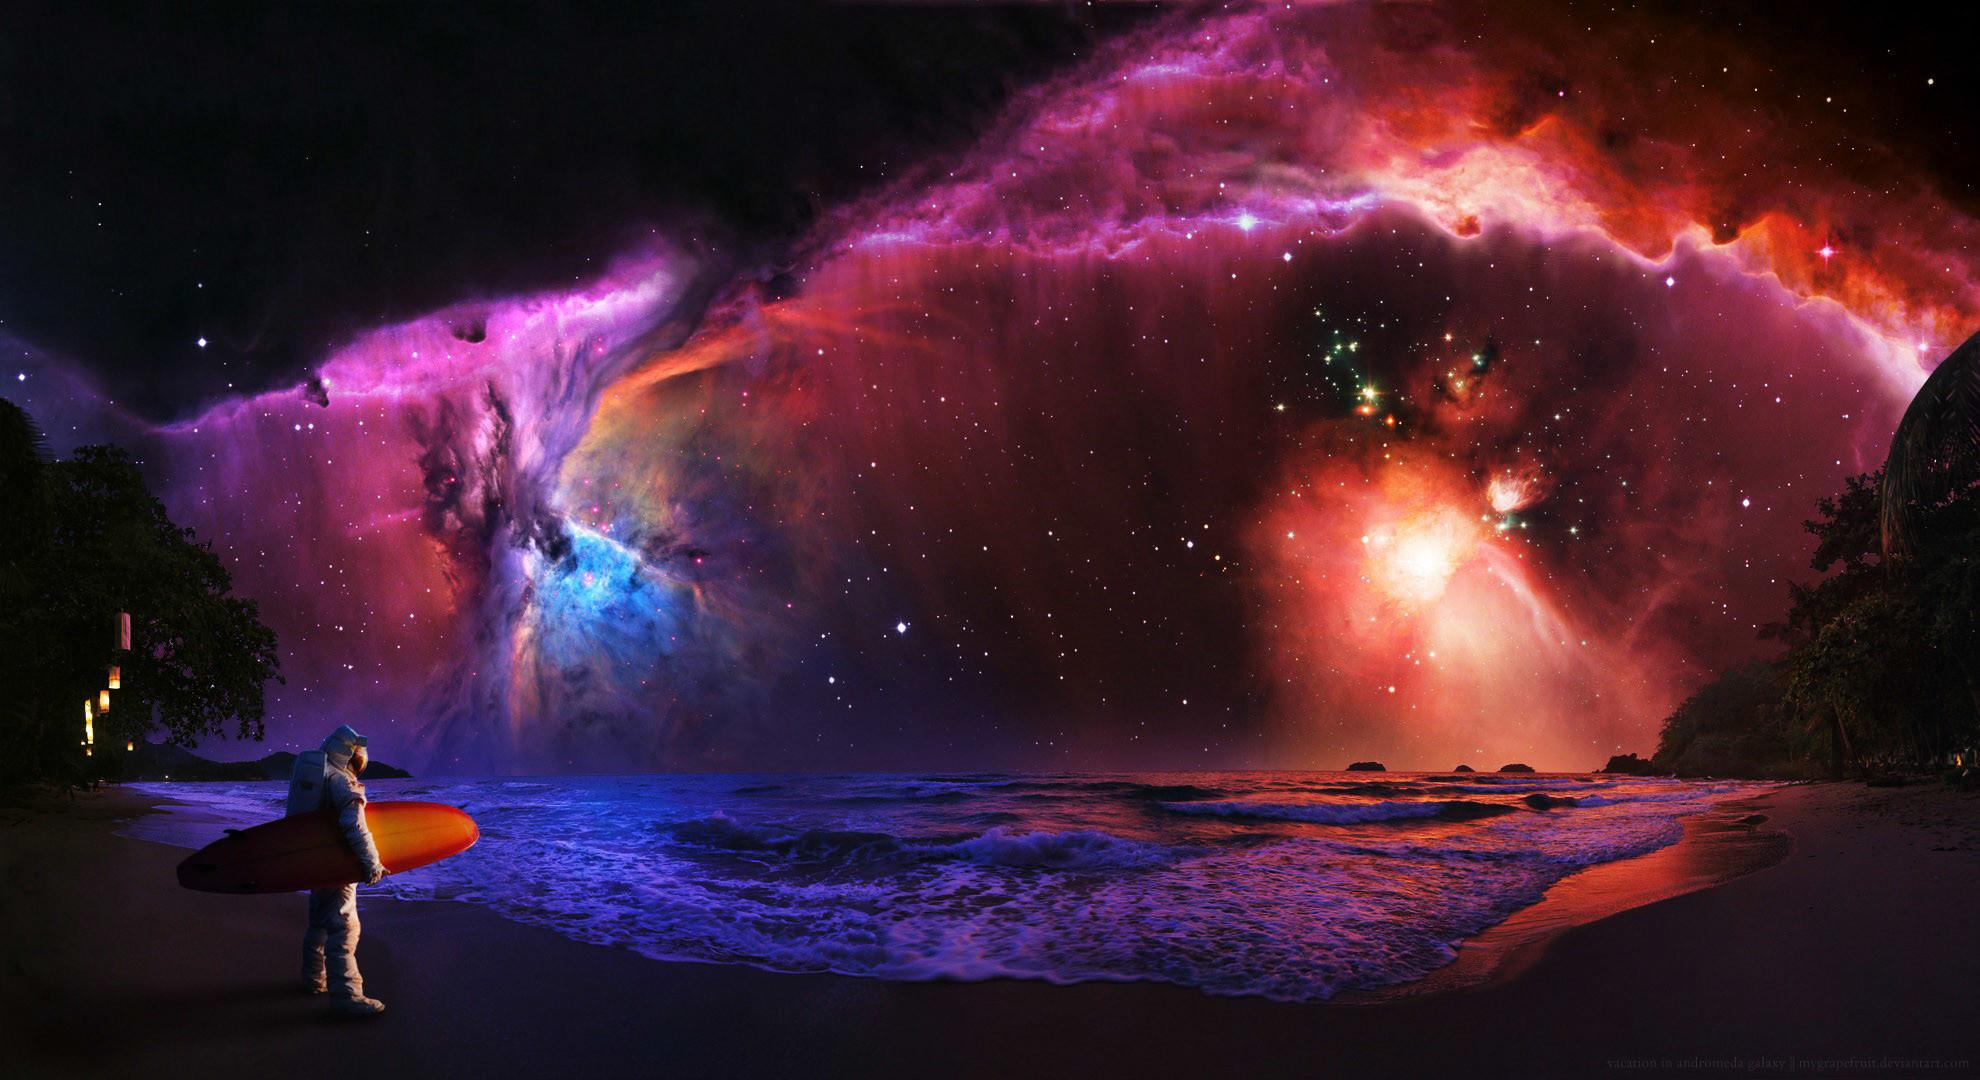 Nasa Wallpaper – Pics about space